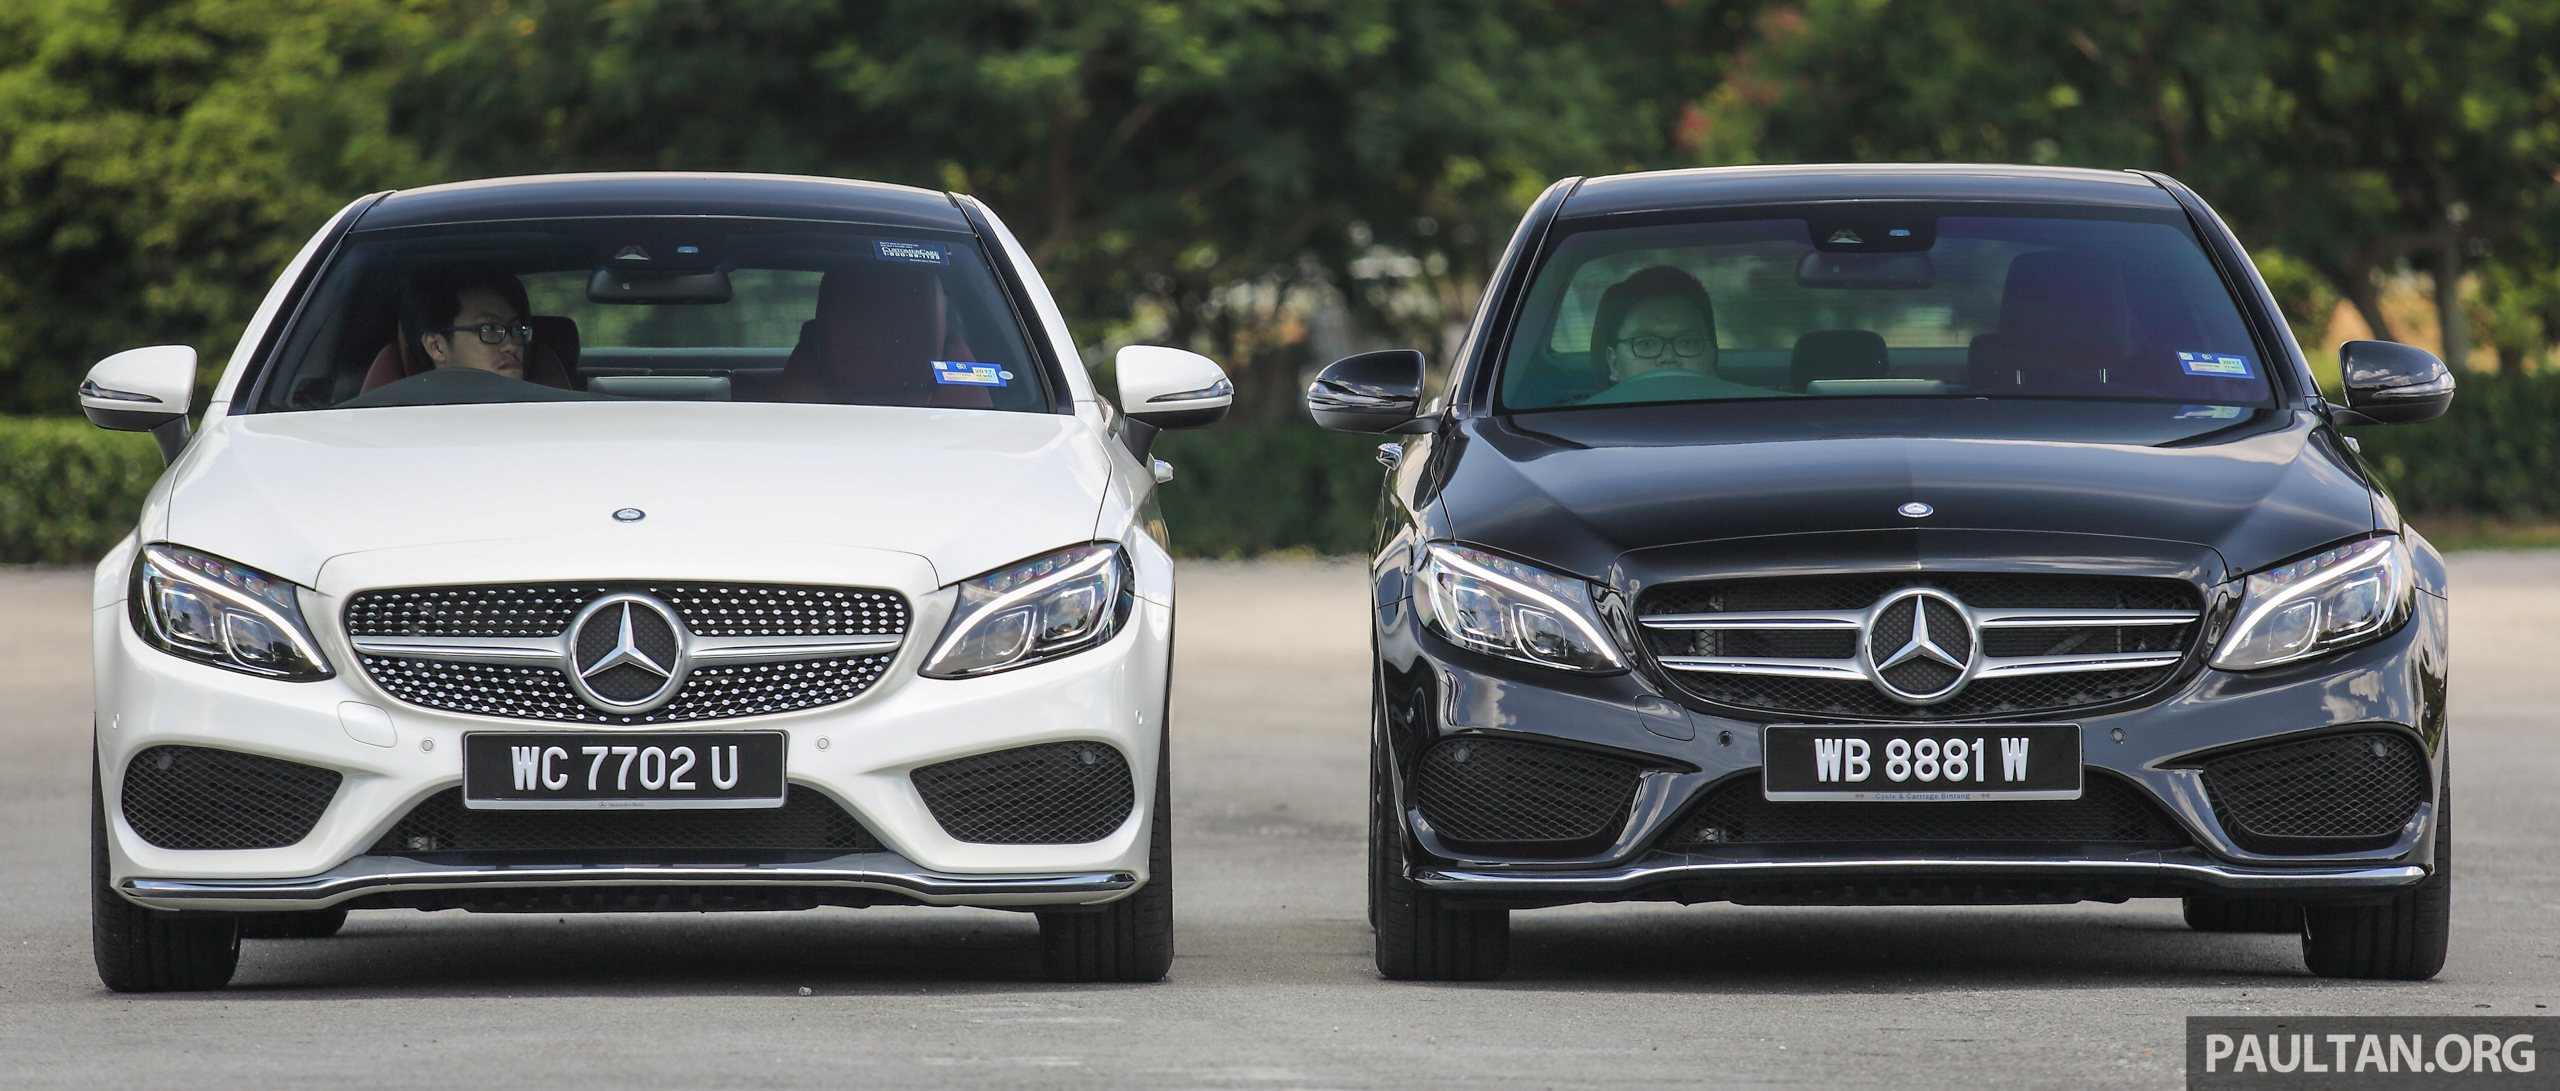 Gallery Mercedes Benz C300 Coupe Vs Sedan Image 495910